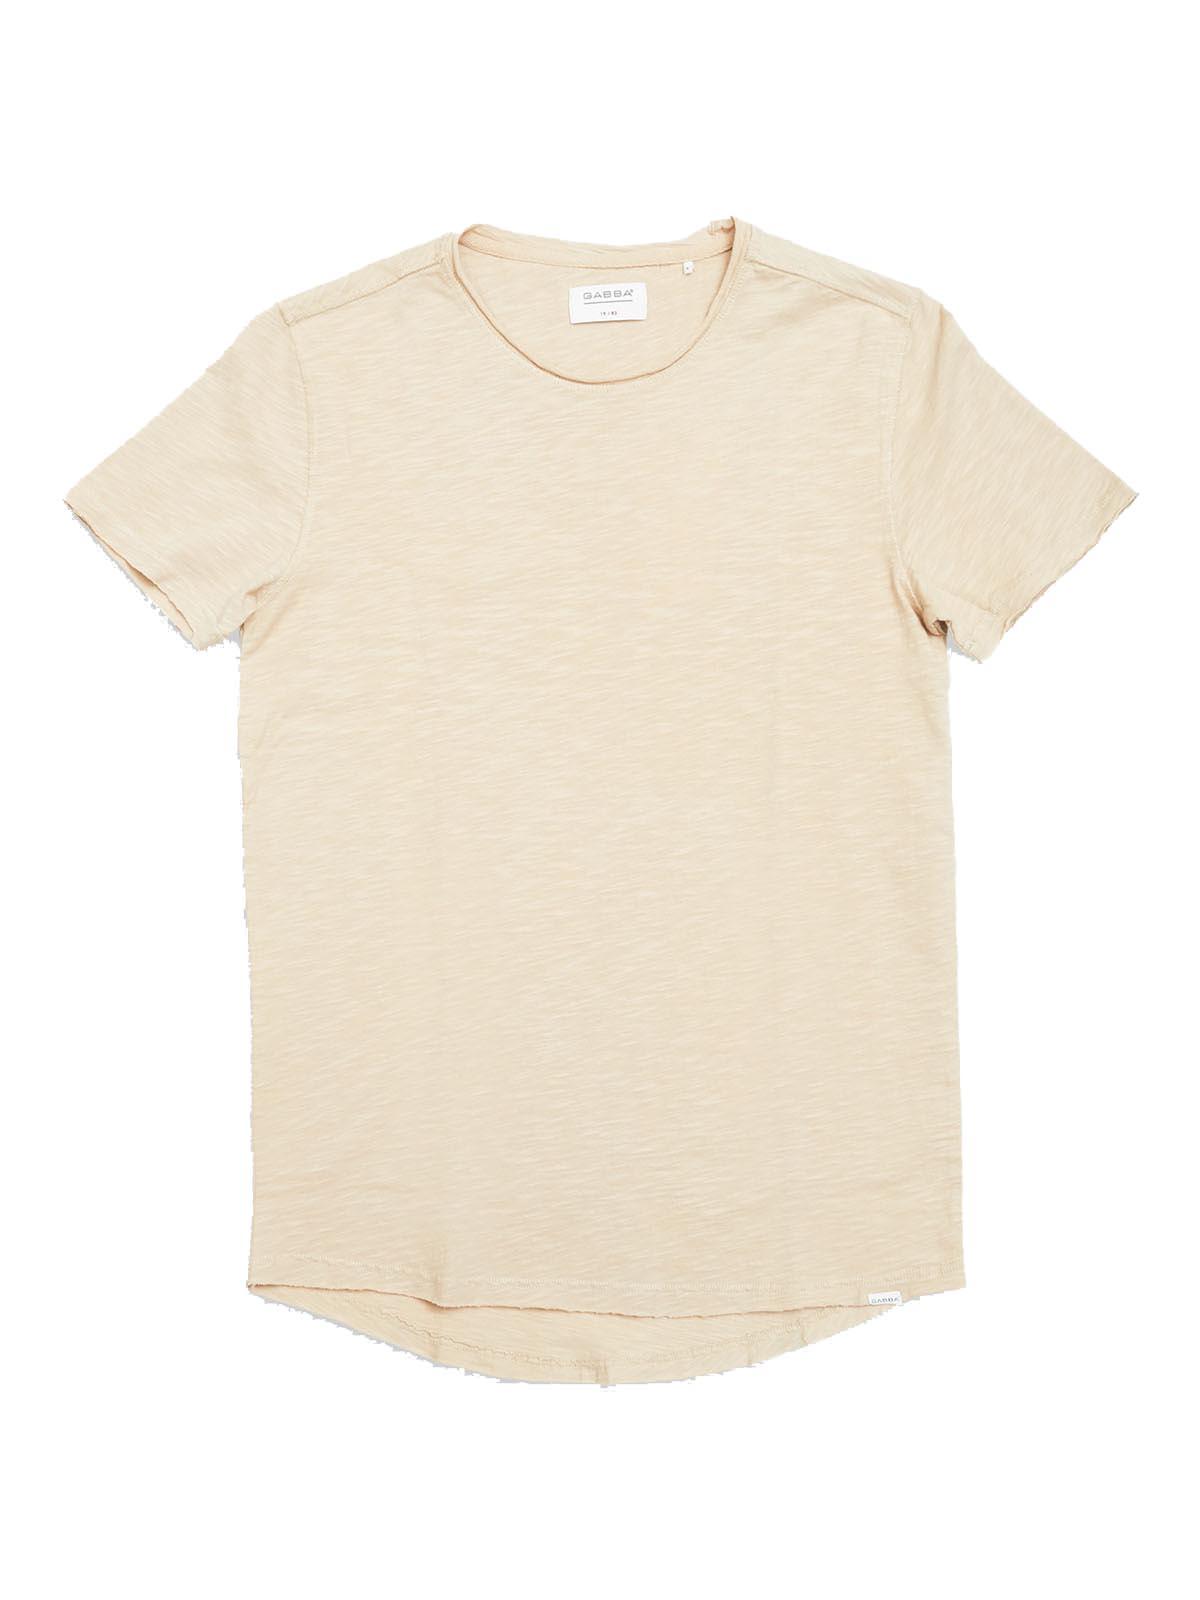 "T-Shirt mit abgerundeten Saum ""Konrad"""